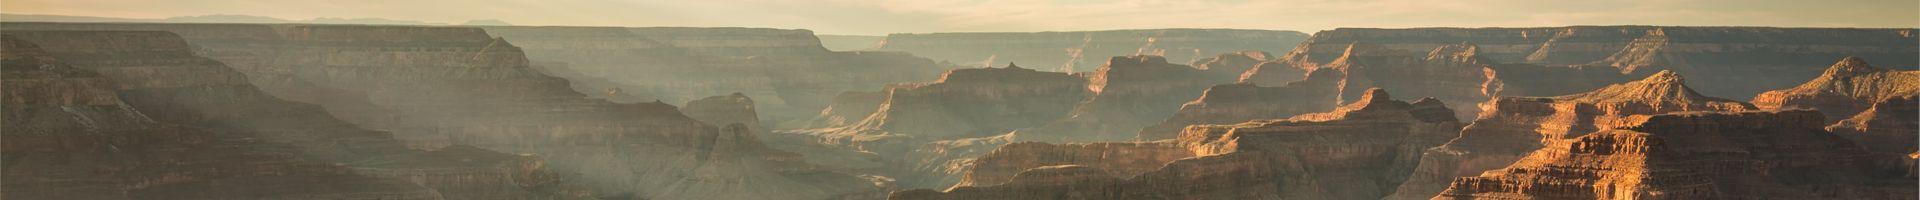 Grand Canyon South Rim Airplane Tours